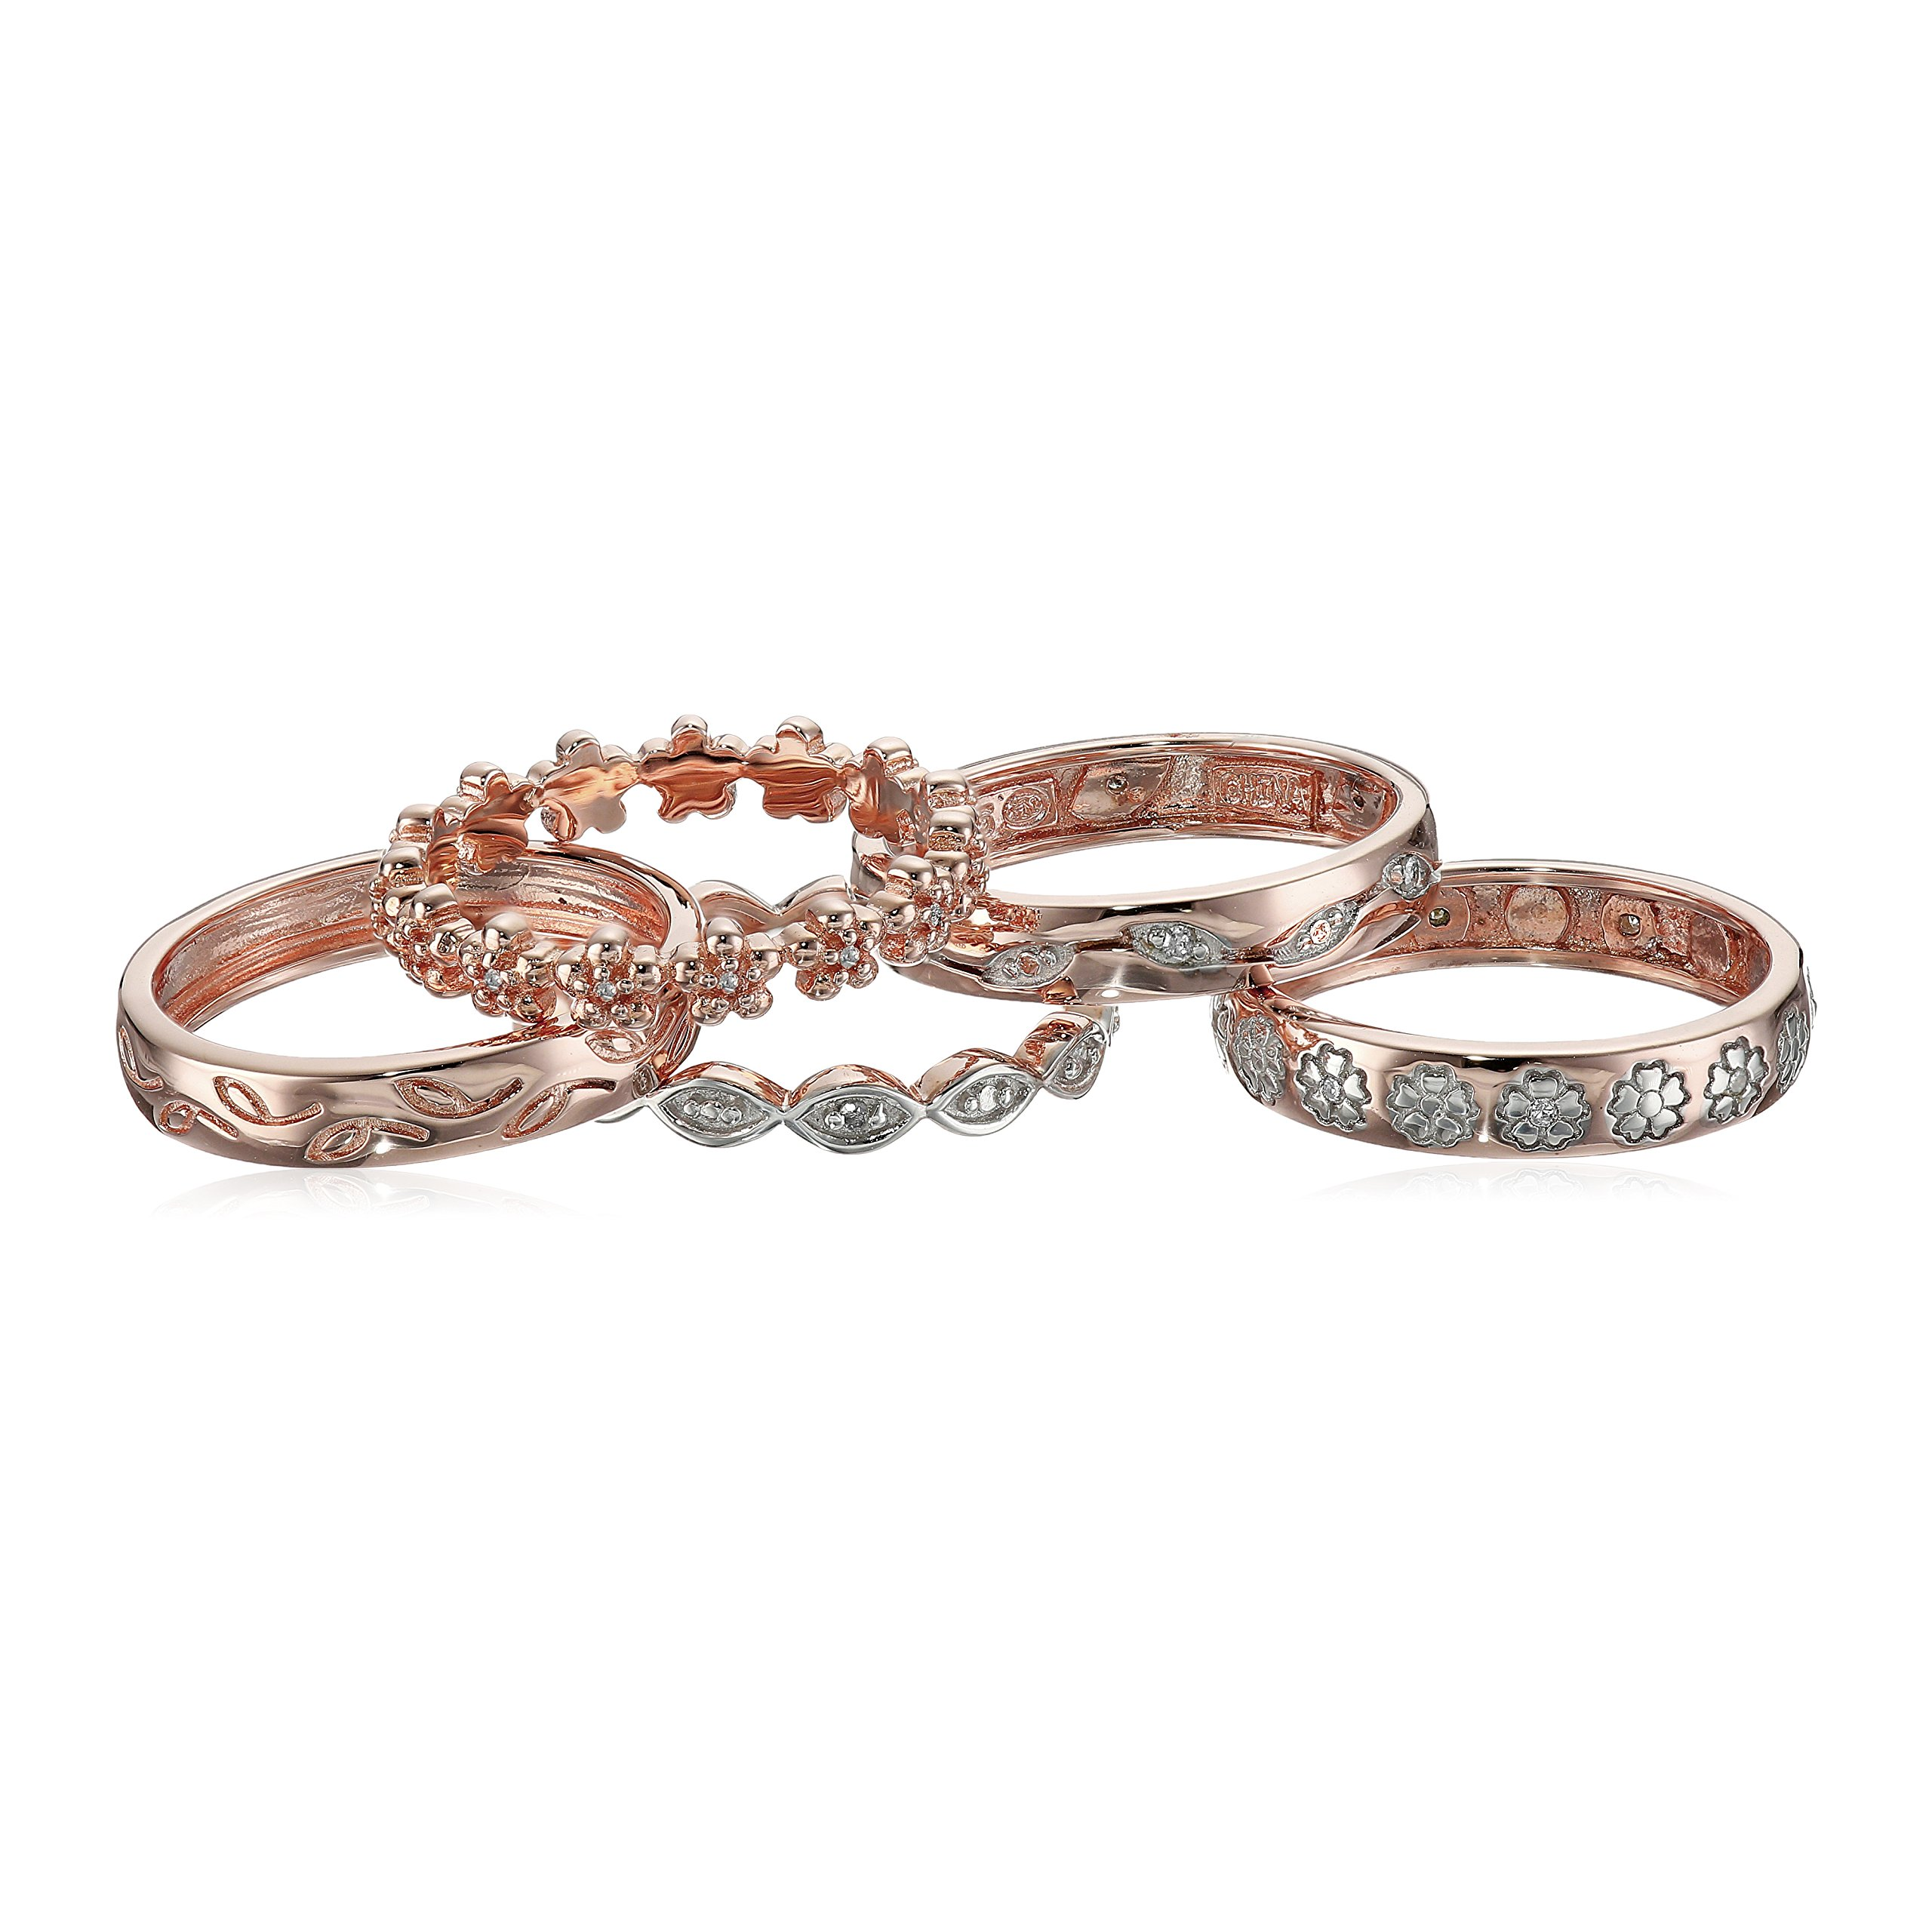 14k Rose Gold Over Sterling Silver Five Diamond Rings Set (1/10 cttw, I-J Color, I2-I3 Clarity), Size 8